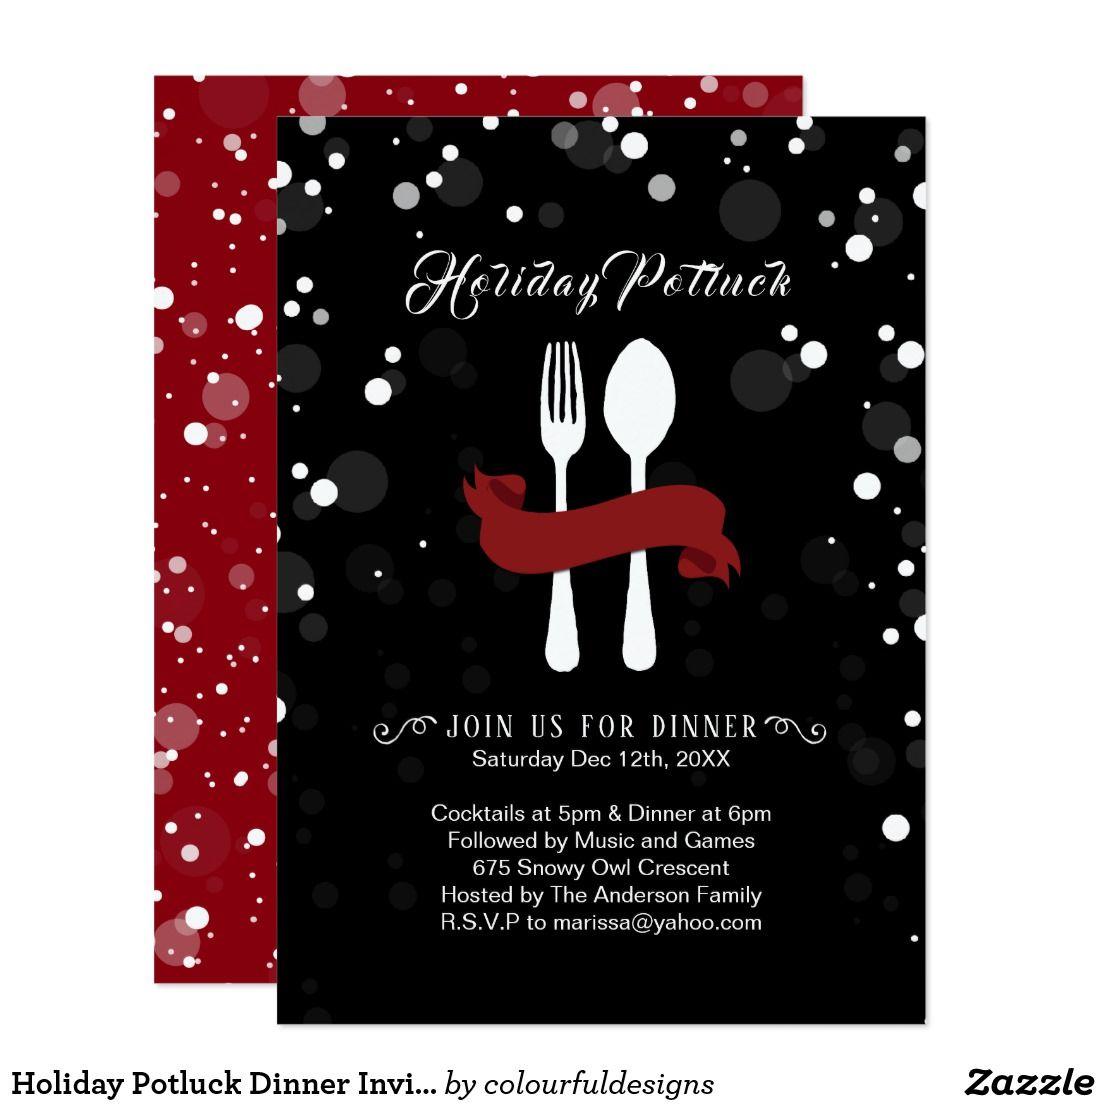 Holiday Potluck Dinner Invitation   Christmas Party Invitations ...